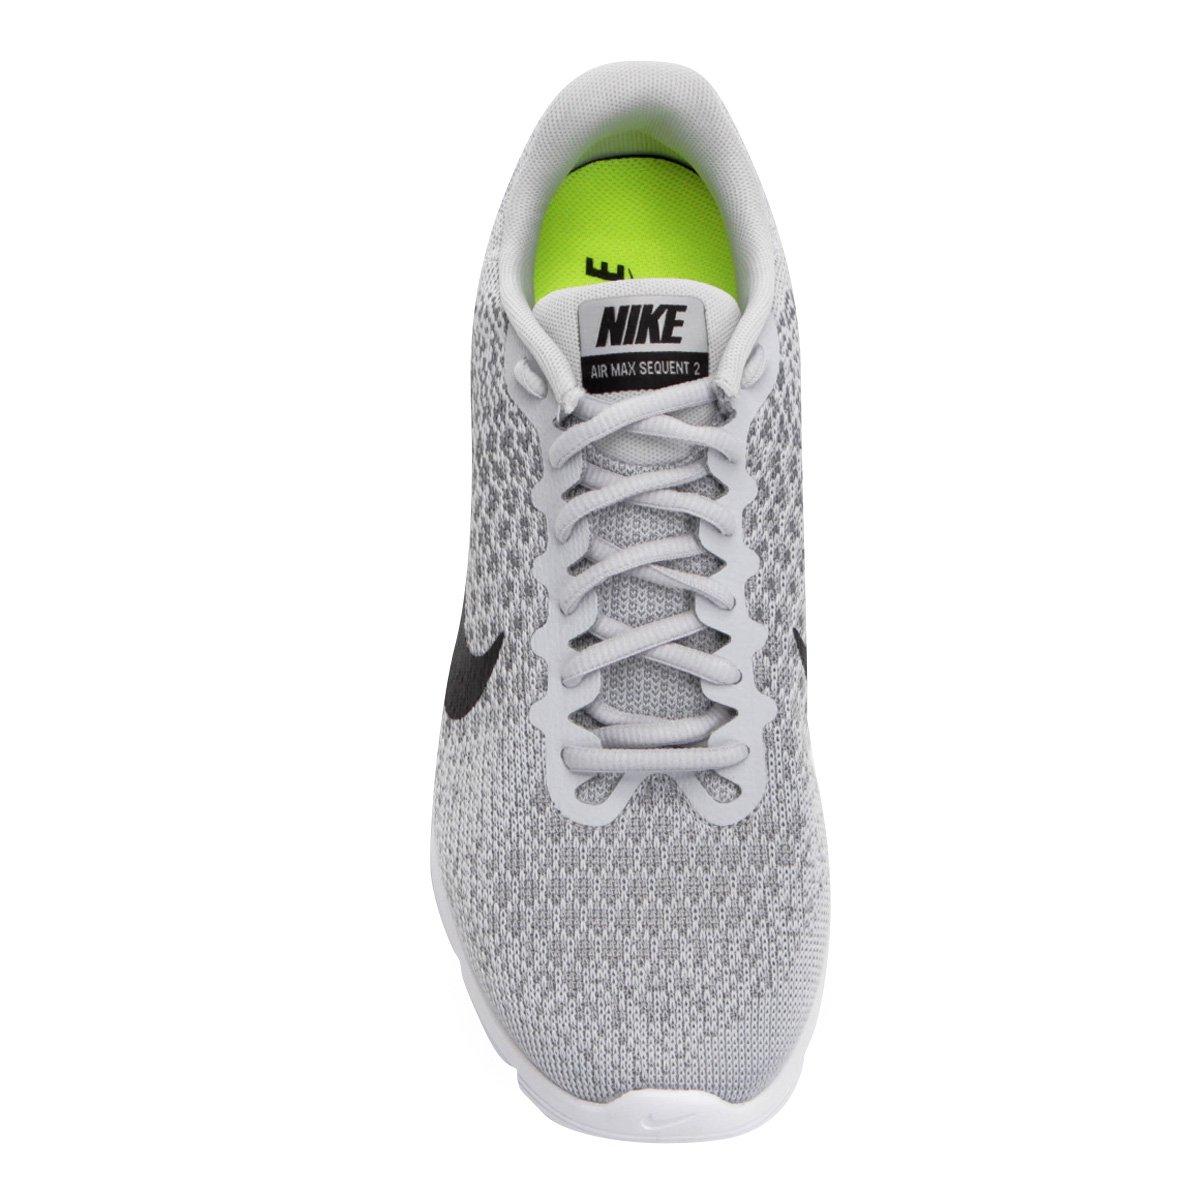 e Preto Max Sequent 2 Prata Masculino Air Tênis Nike x8w1PP0